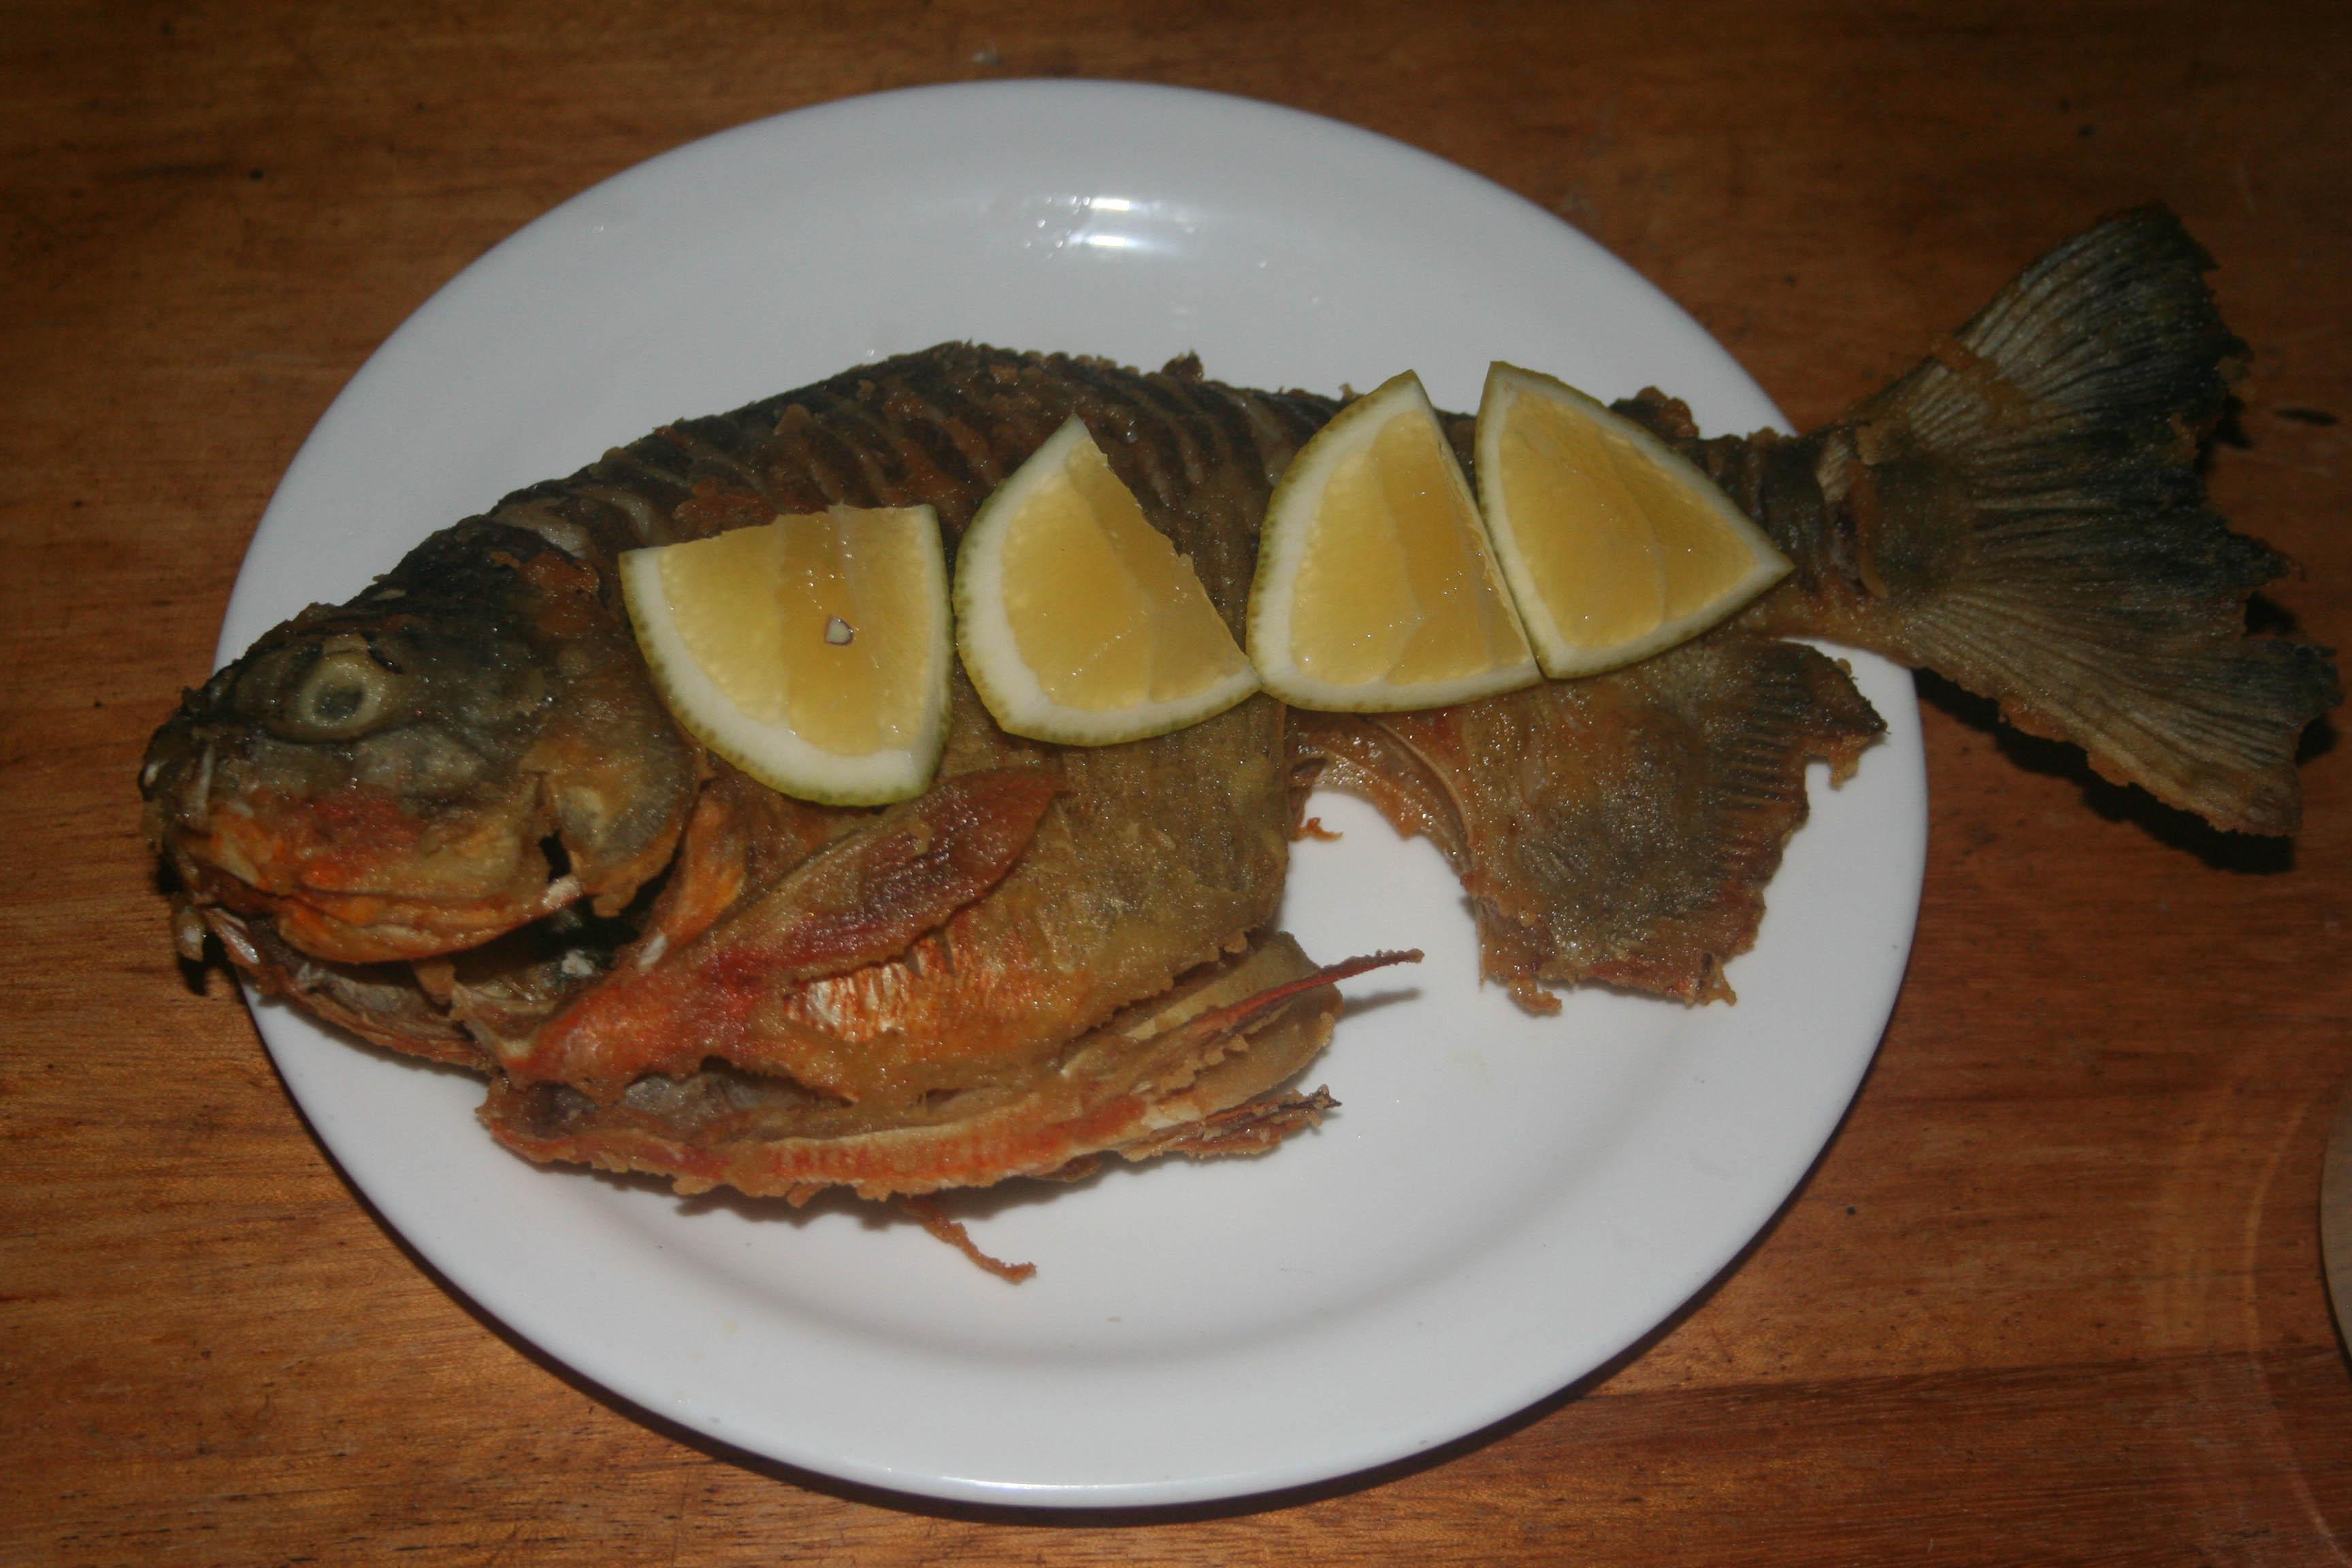 https://cookingintongues.files.wordpress.com/2012/03/132.jpg